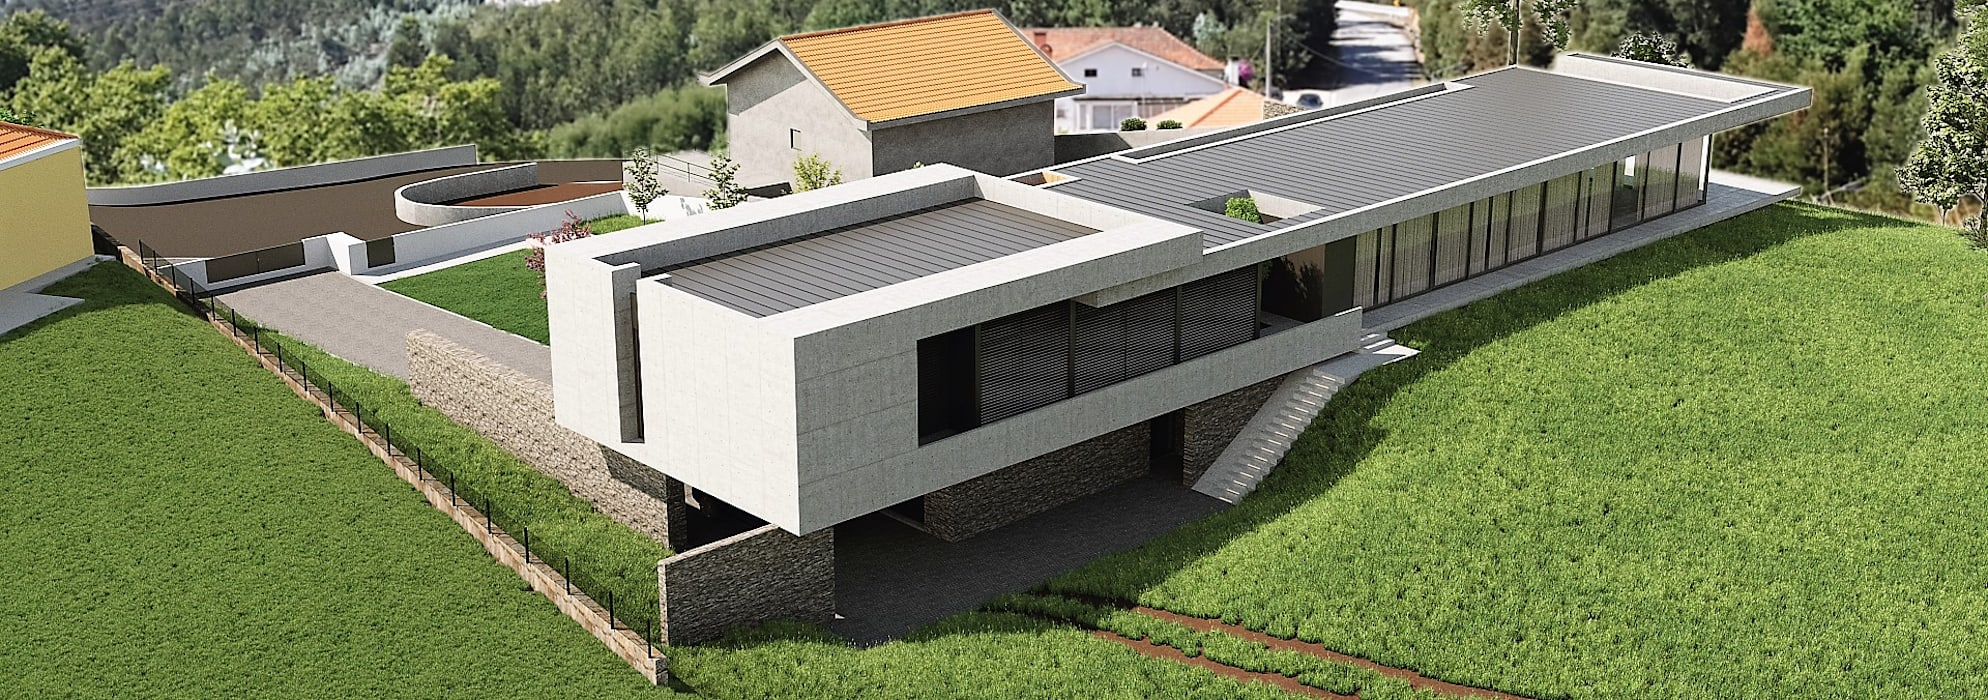 Moradia Unifamiliar  - Gondomar - Tipologia T3: Casas unifamilares  por EsboçoSigma, Lda,Moderno